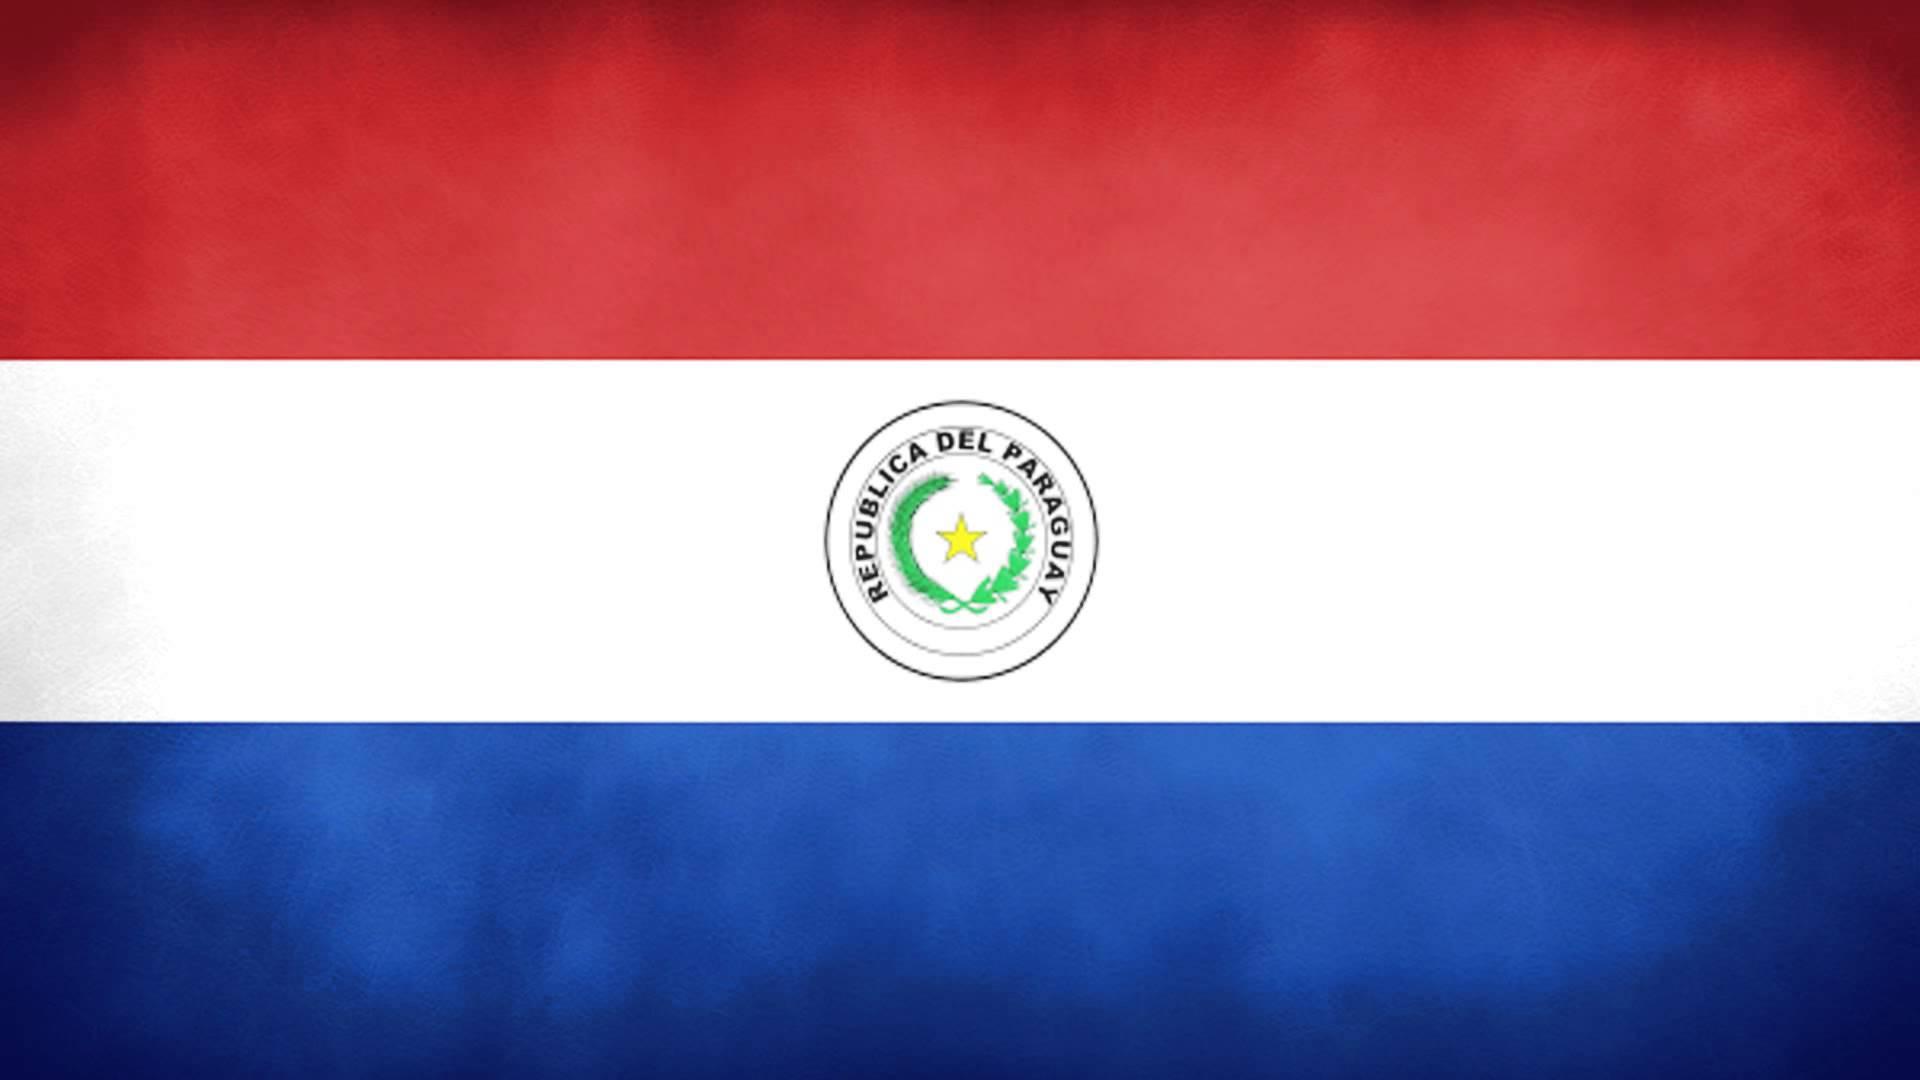 Paraguay grunge flag photo